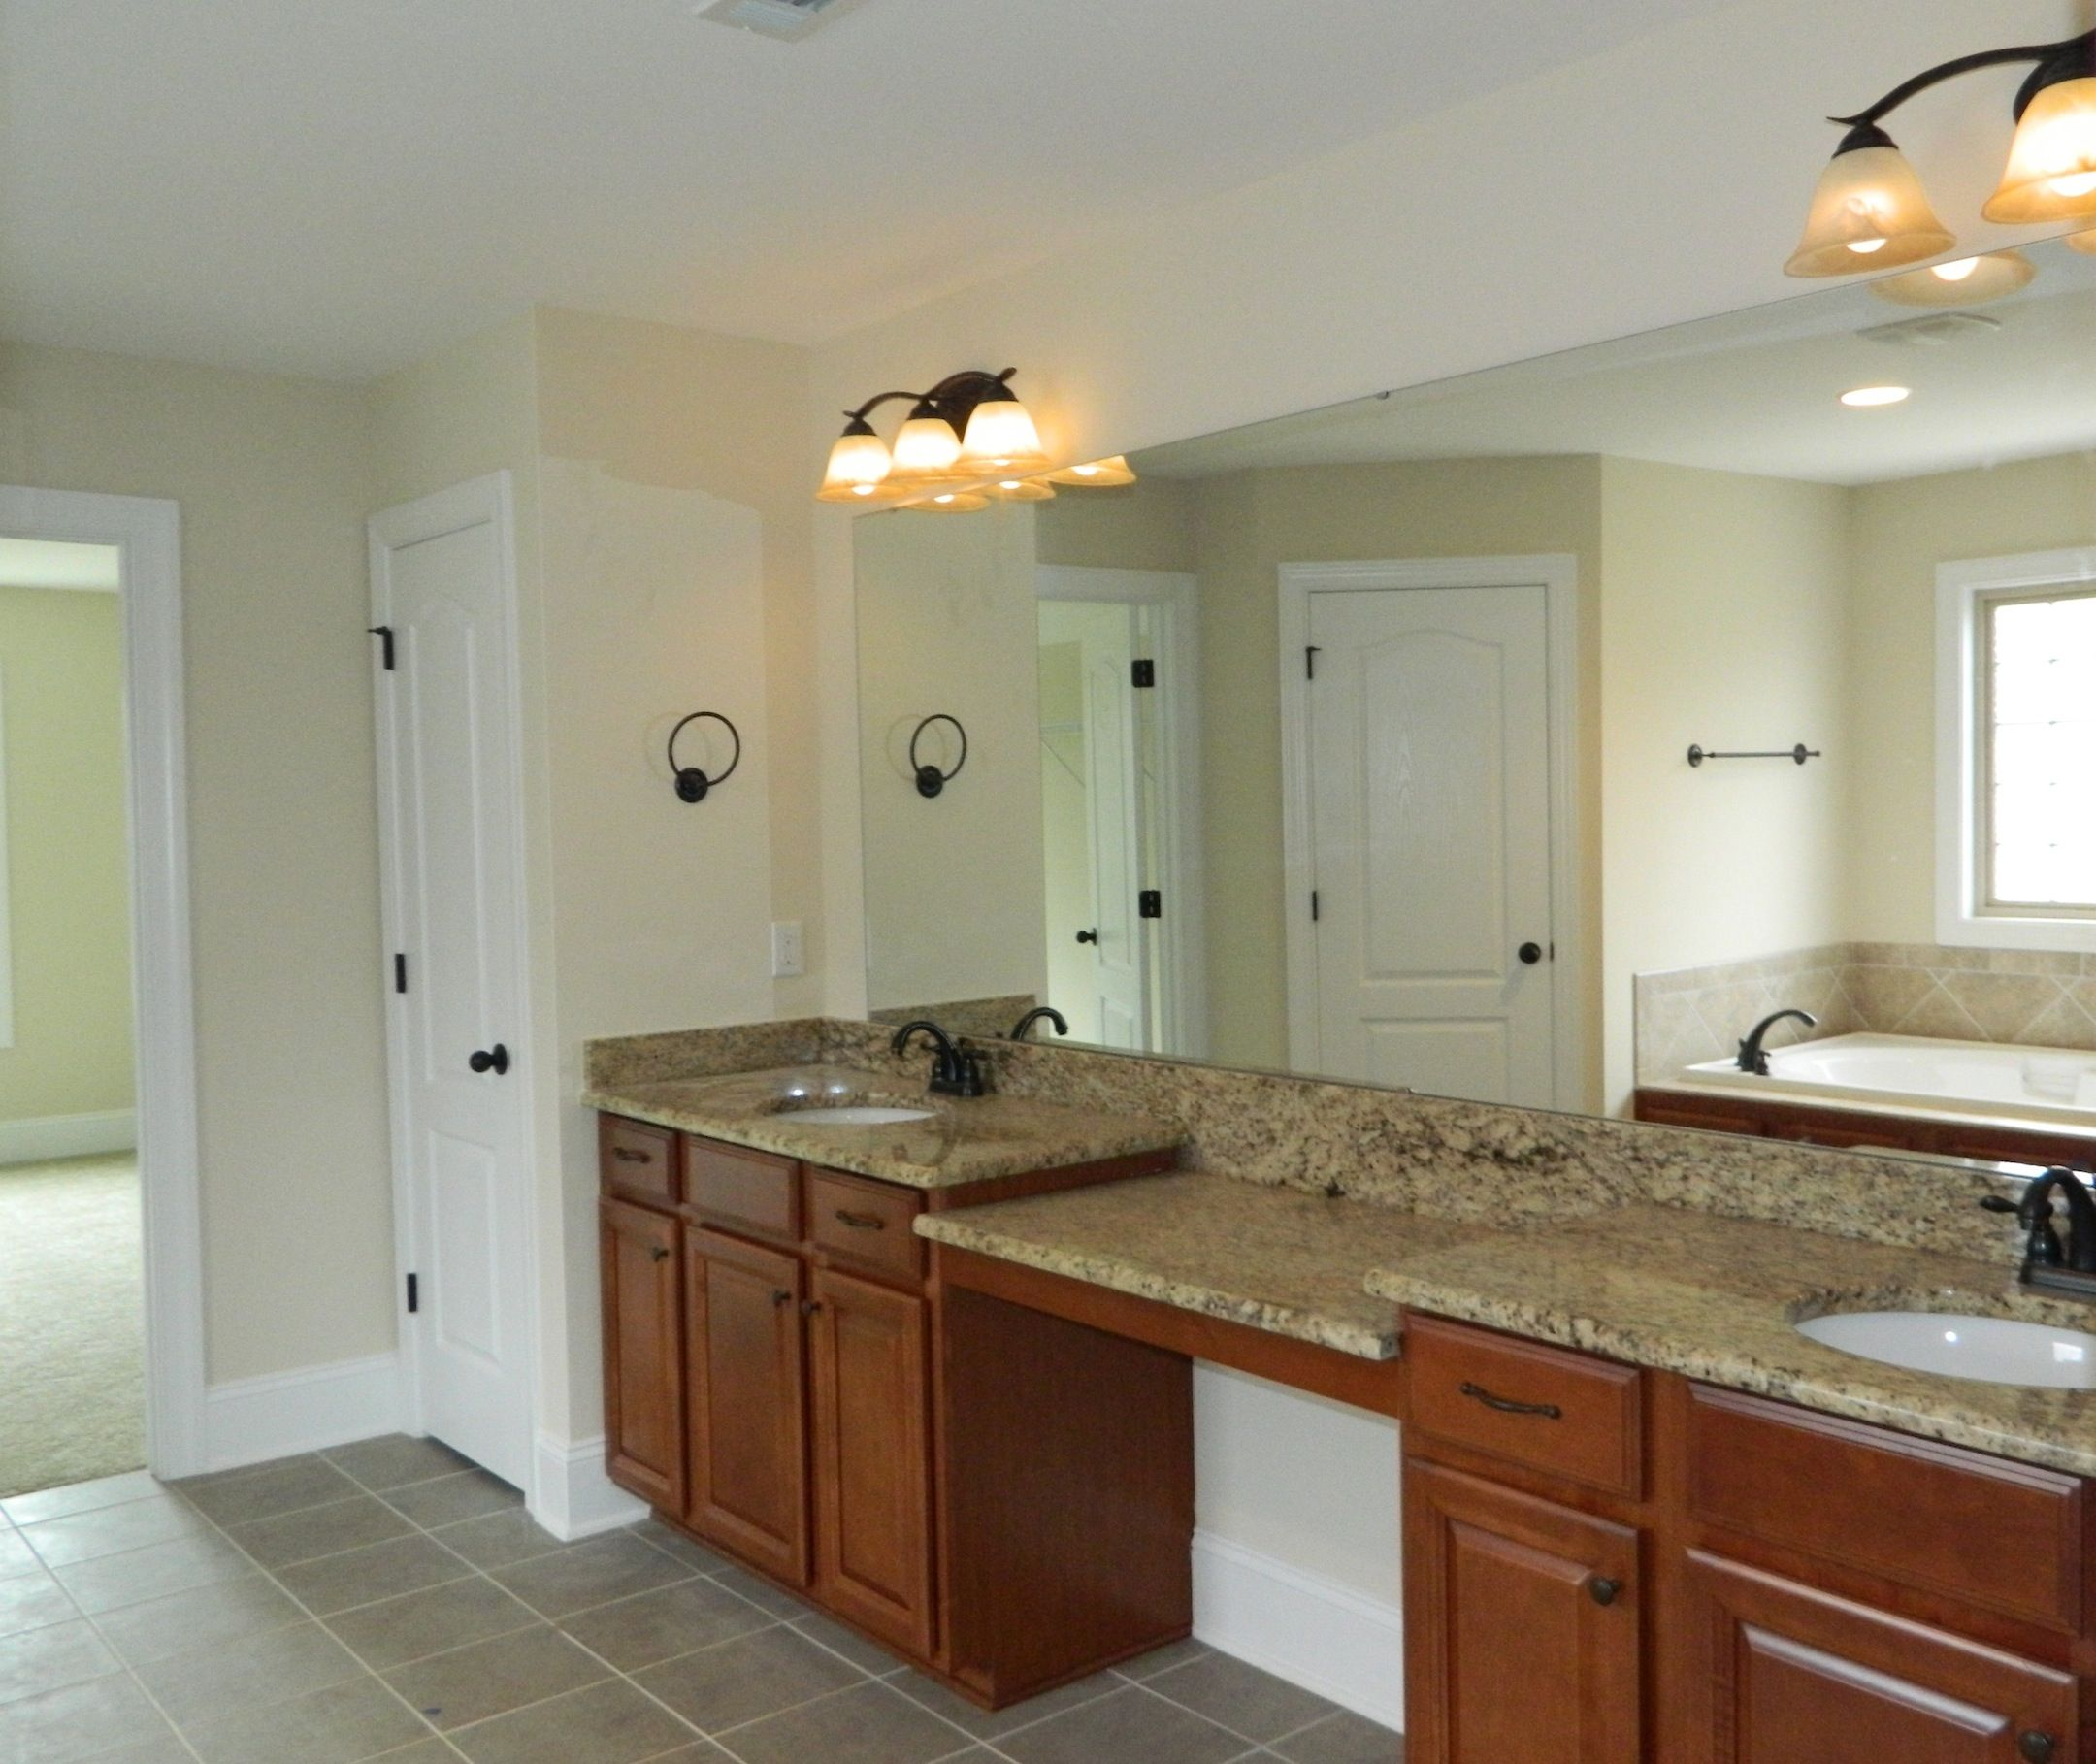 Kitchen Cabinets Scottsdale Az: Timberlake Scottsdale Maple Cognac. Giallo Ornamental